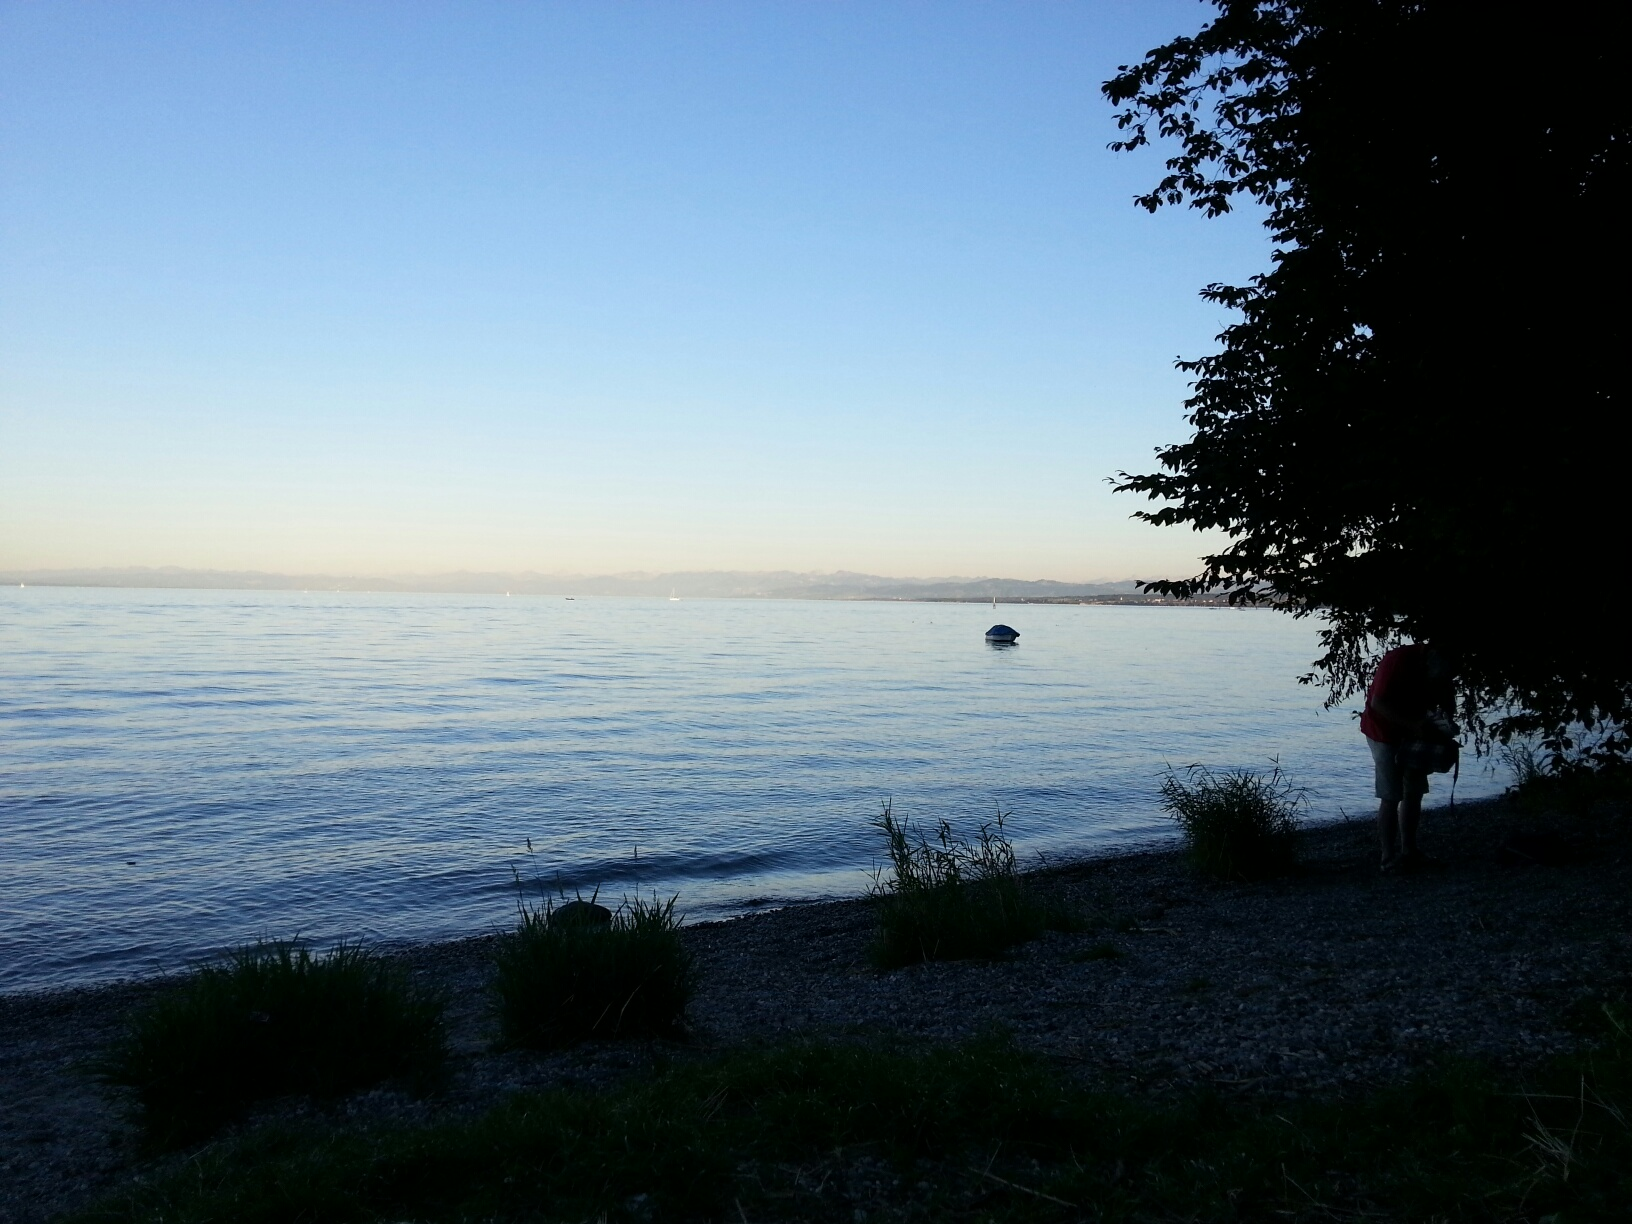 Hörlepark Blick über den See Richtung Alpen